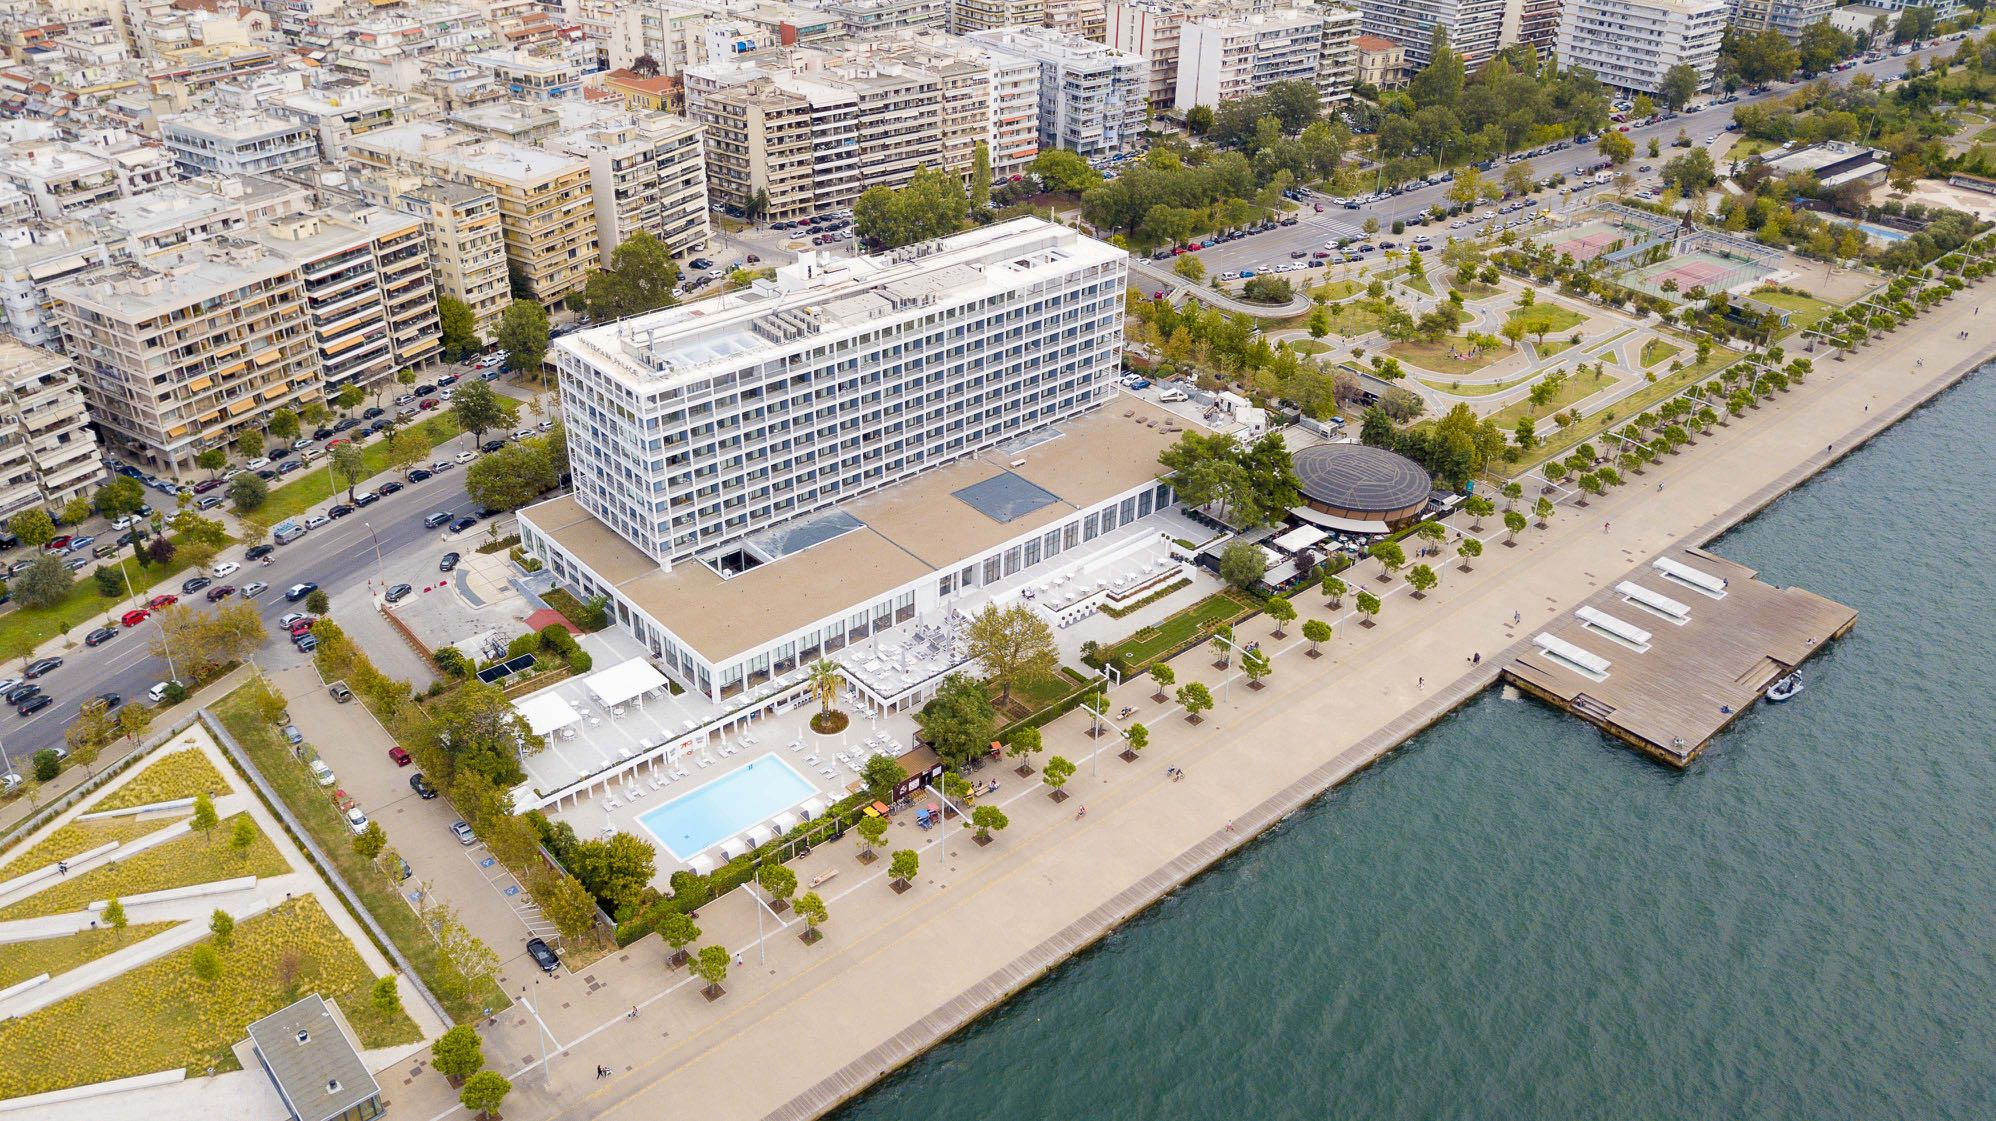 Makedonia Palace Hotel Panoramic View